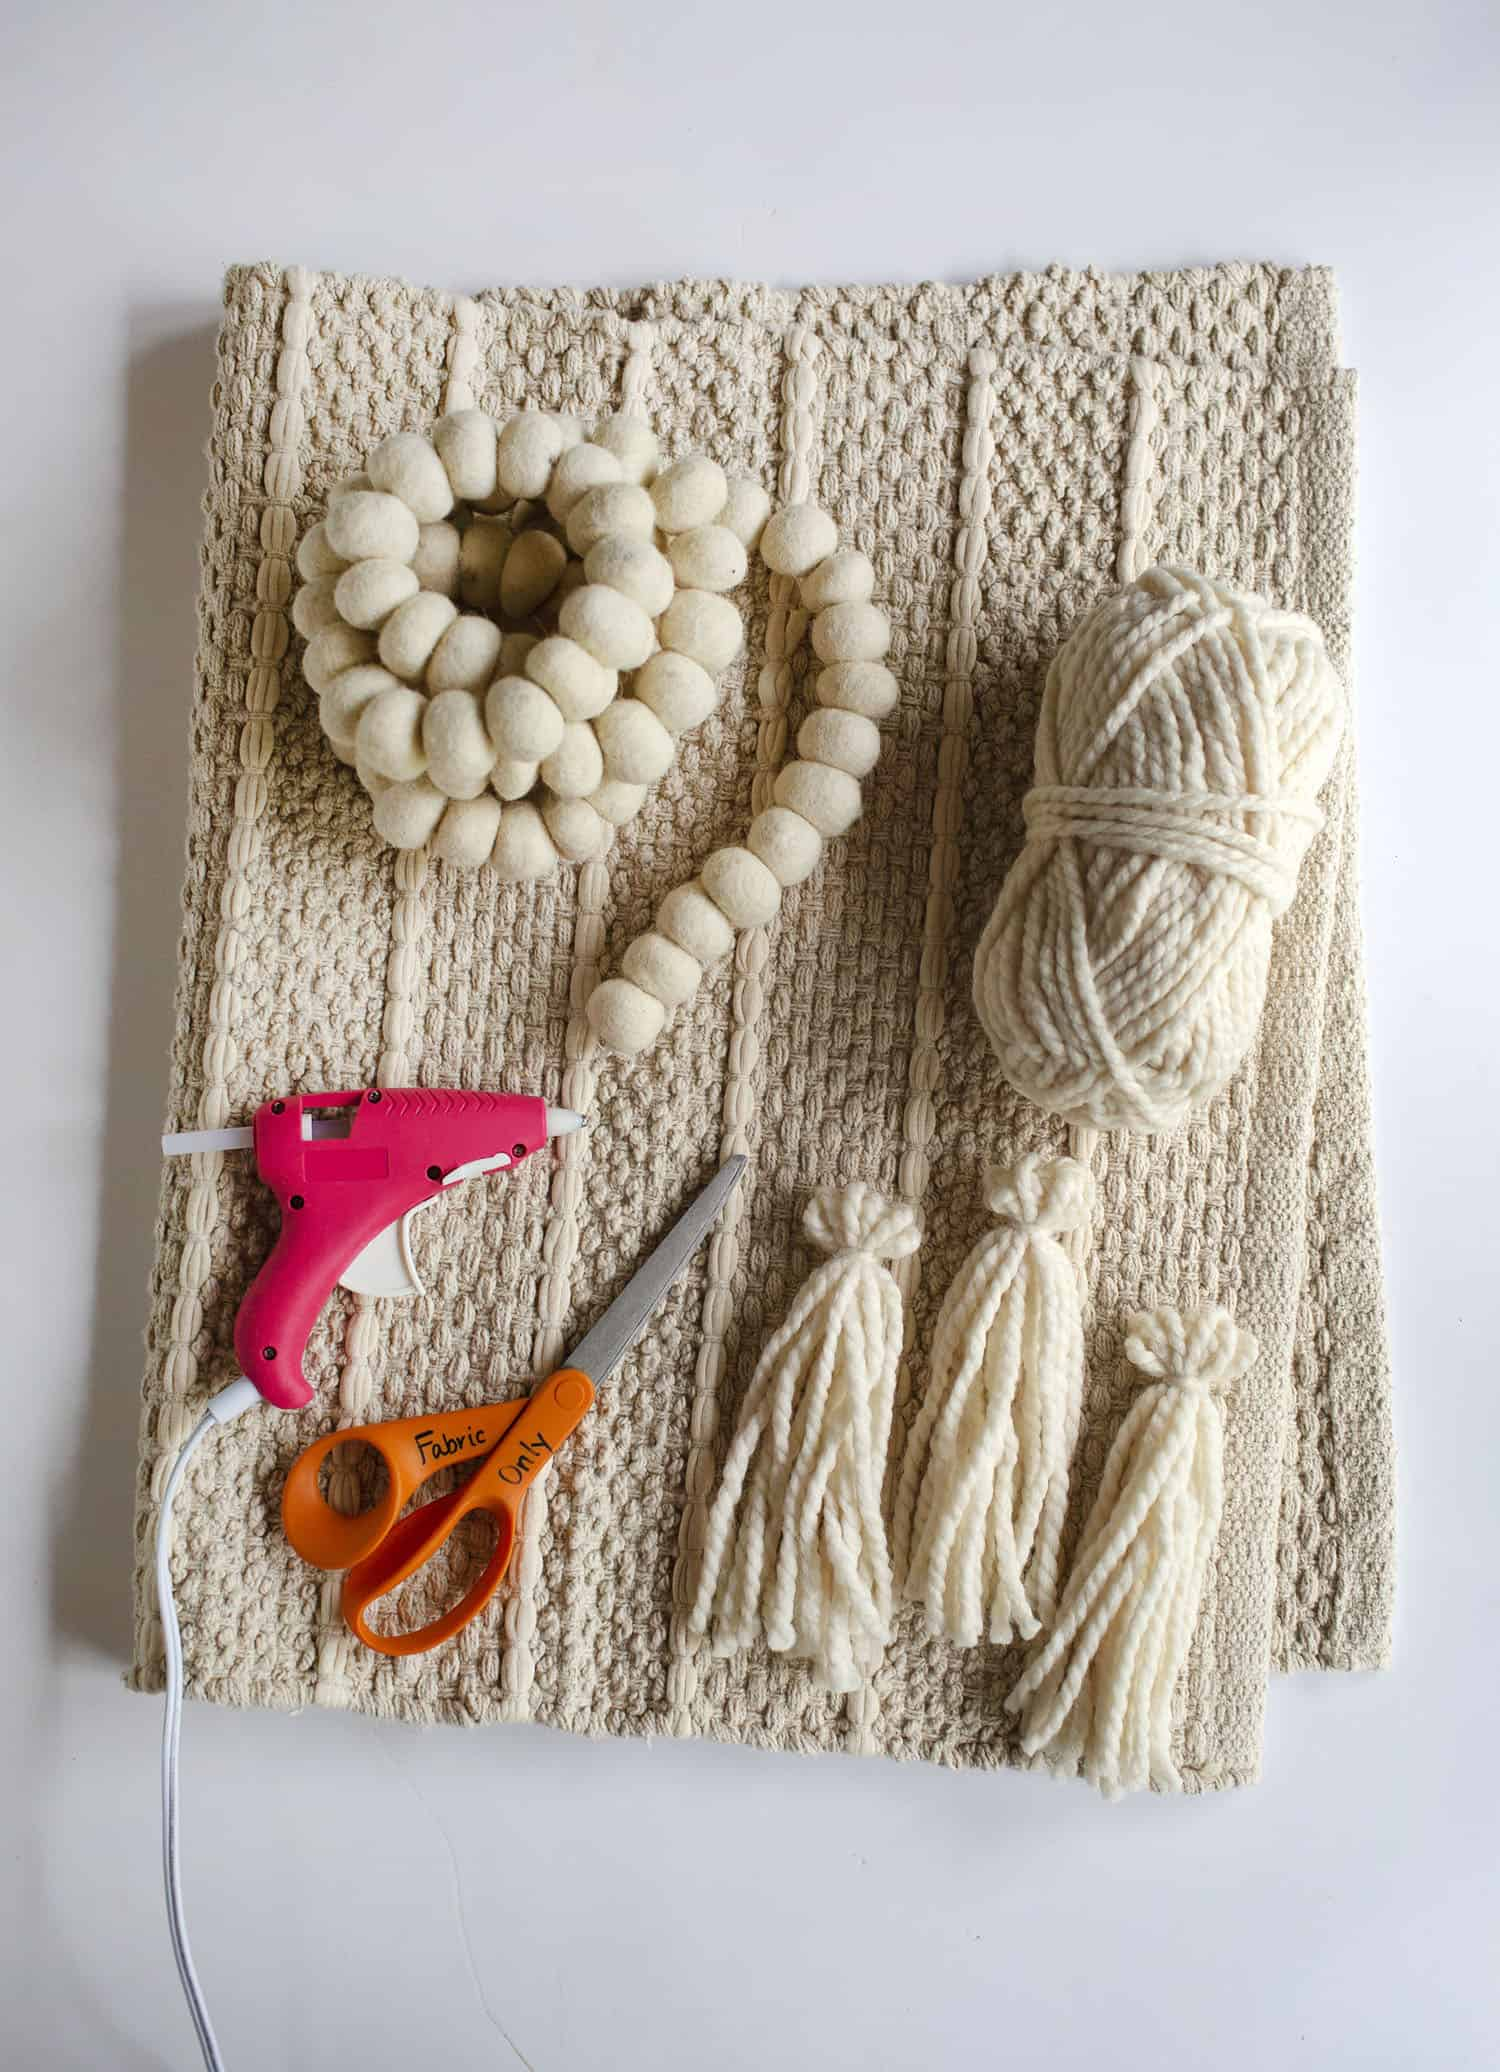 Supplies yarn for tassels I used three